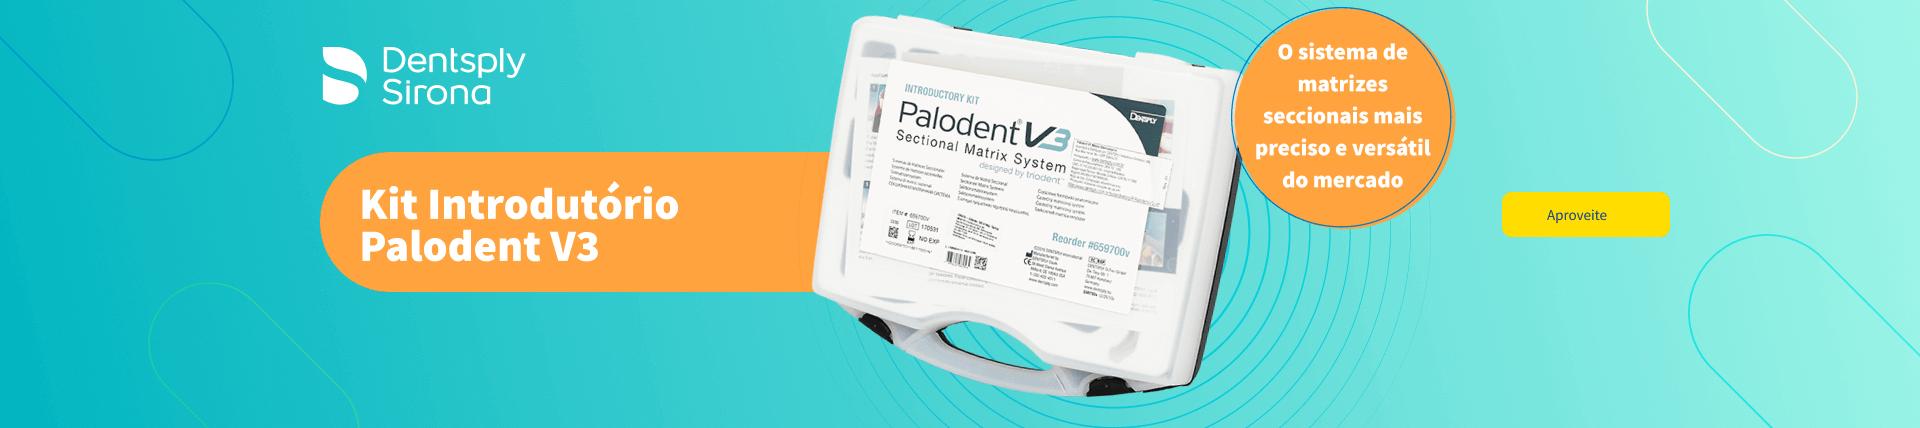 Confira Kit Introdutório Palodent V3 Dentsply Sirona   Dental Cremer